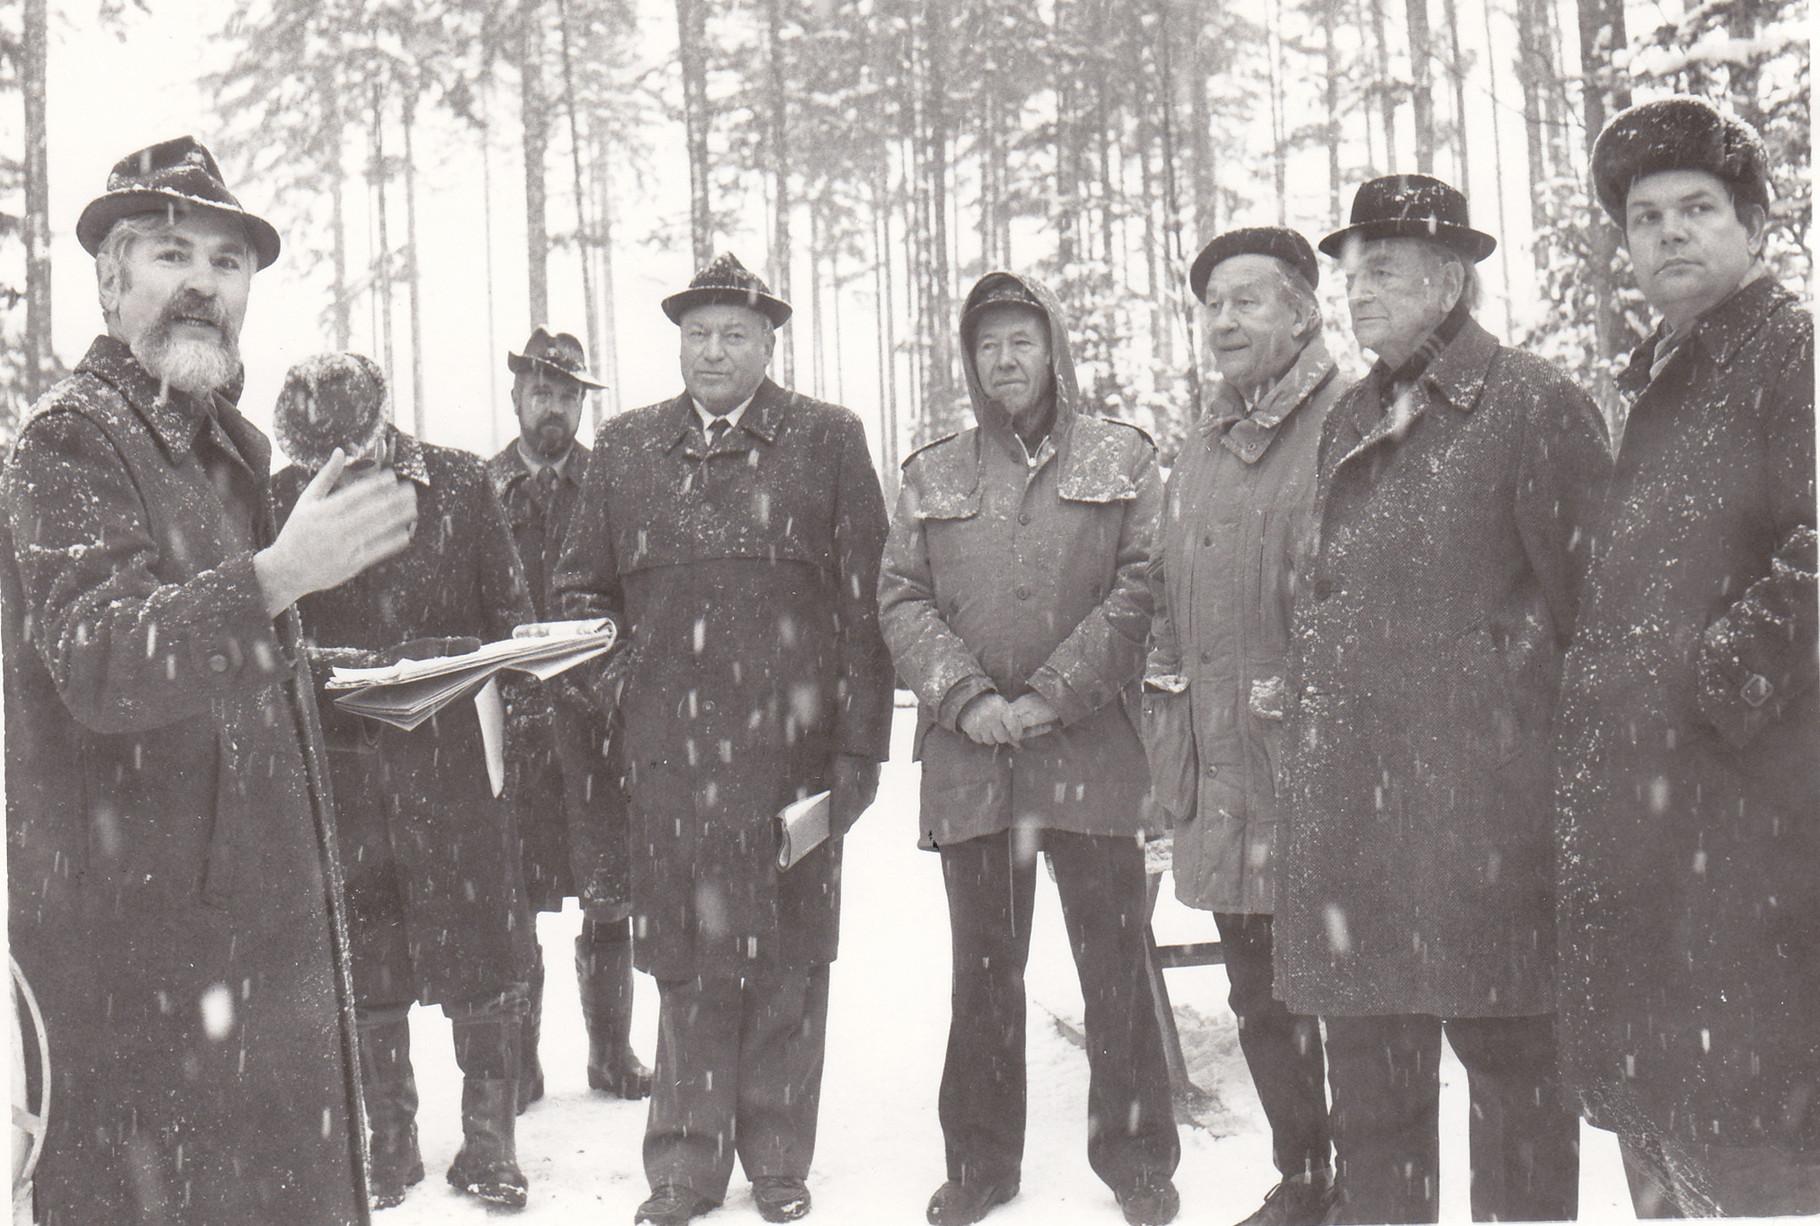 1990: Erster Pressetermin: 1.v.l.: FDir Siegfried Häfele, 3.v.l.: FOAR Walter Geiger, 4.v.l: SDW-Landesvorsitzender StS Ventur-Schöttle,5.v.l. Stv. SDW-Landesvors. Landtagsvizepräsident Hans Albrecht